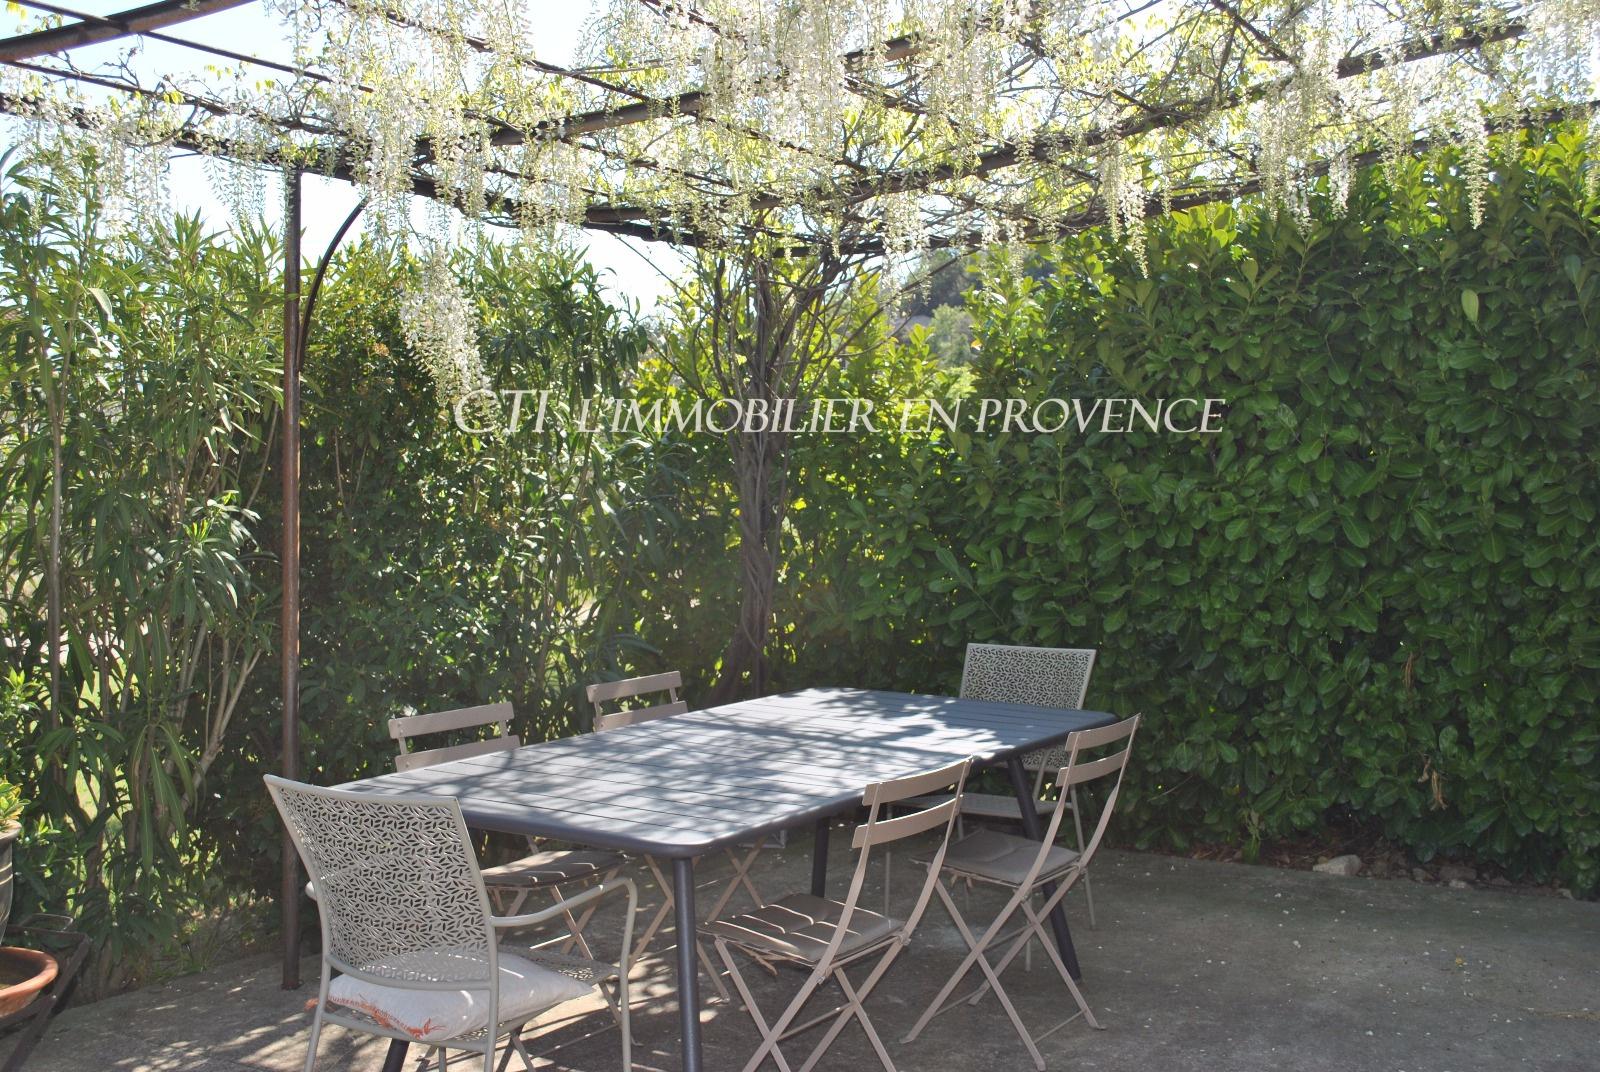 0 www.cti-provence.net Vente grande bastide en 2 habitations garage, grand terrain,